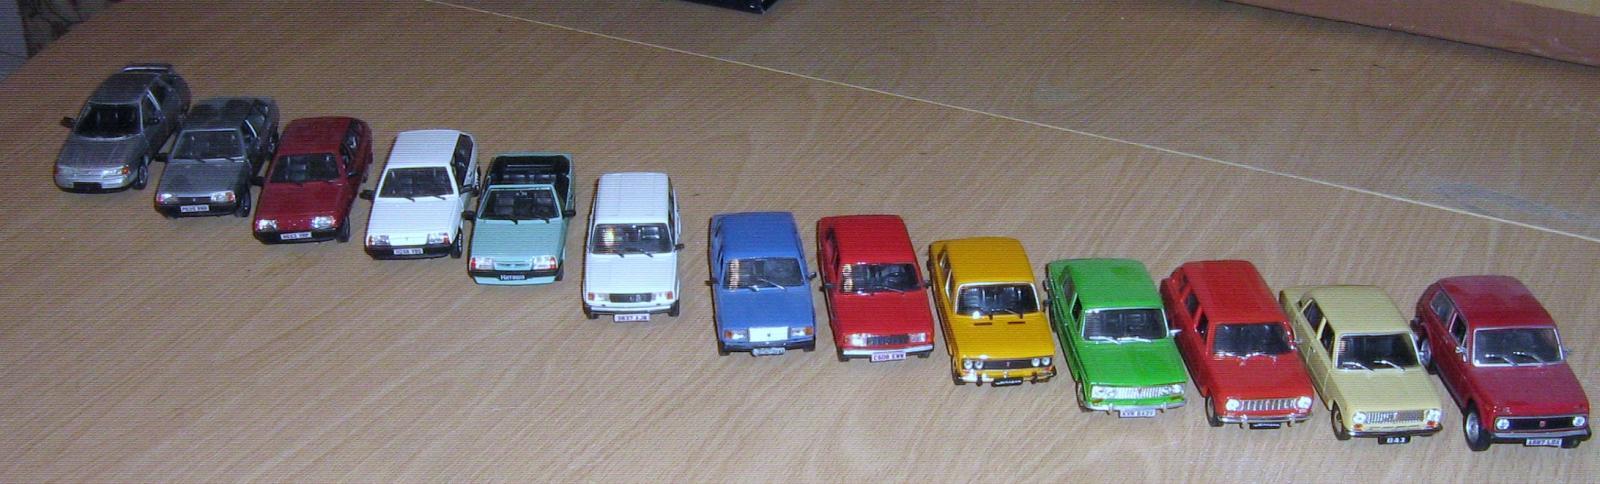 Model Lada collection.JPG